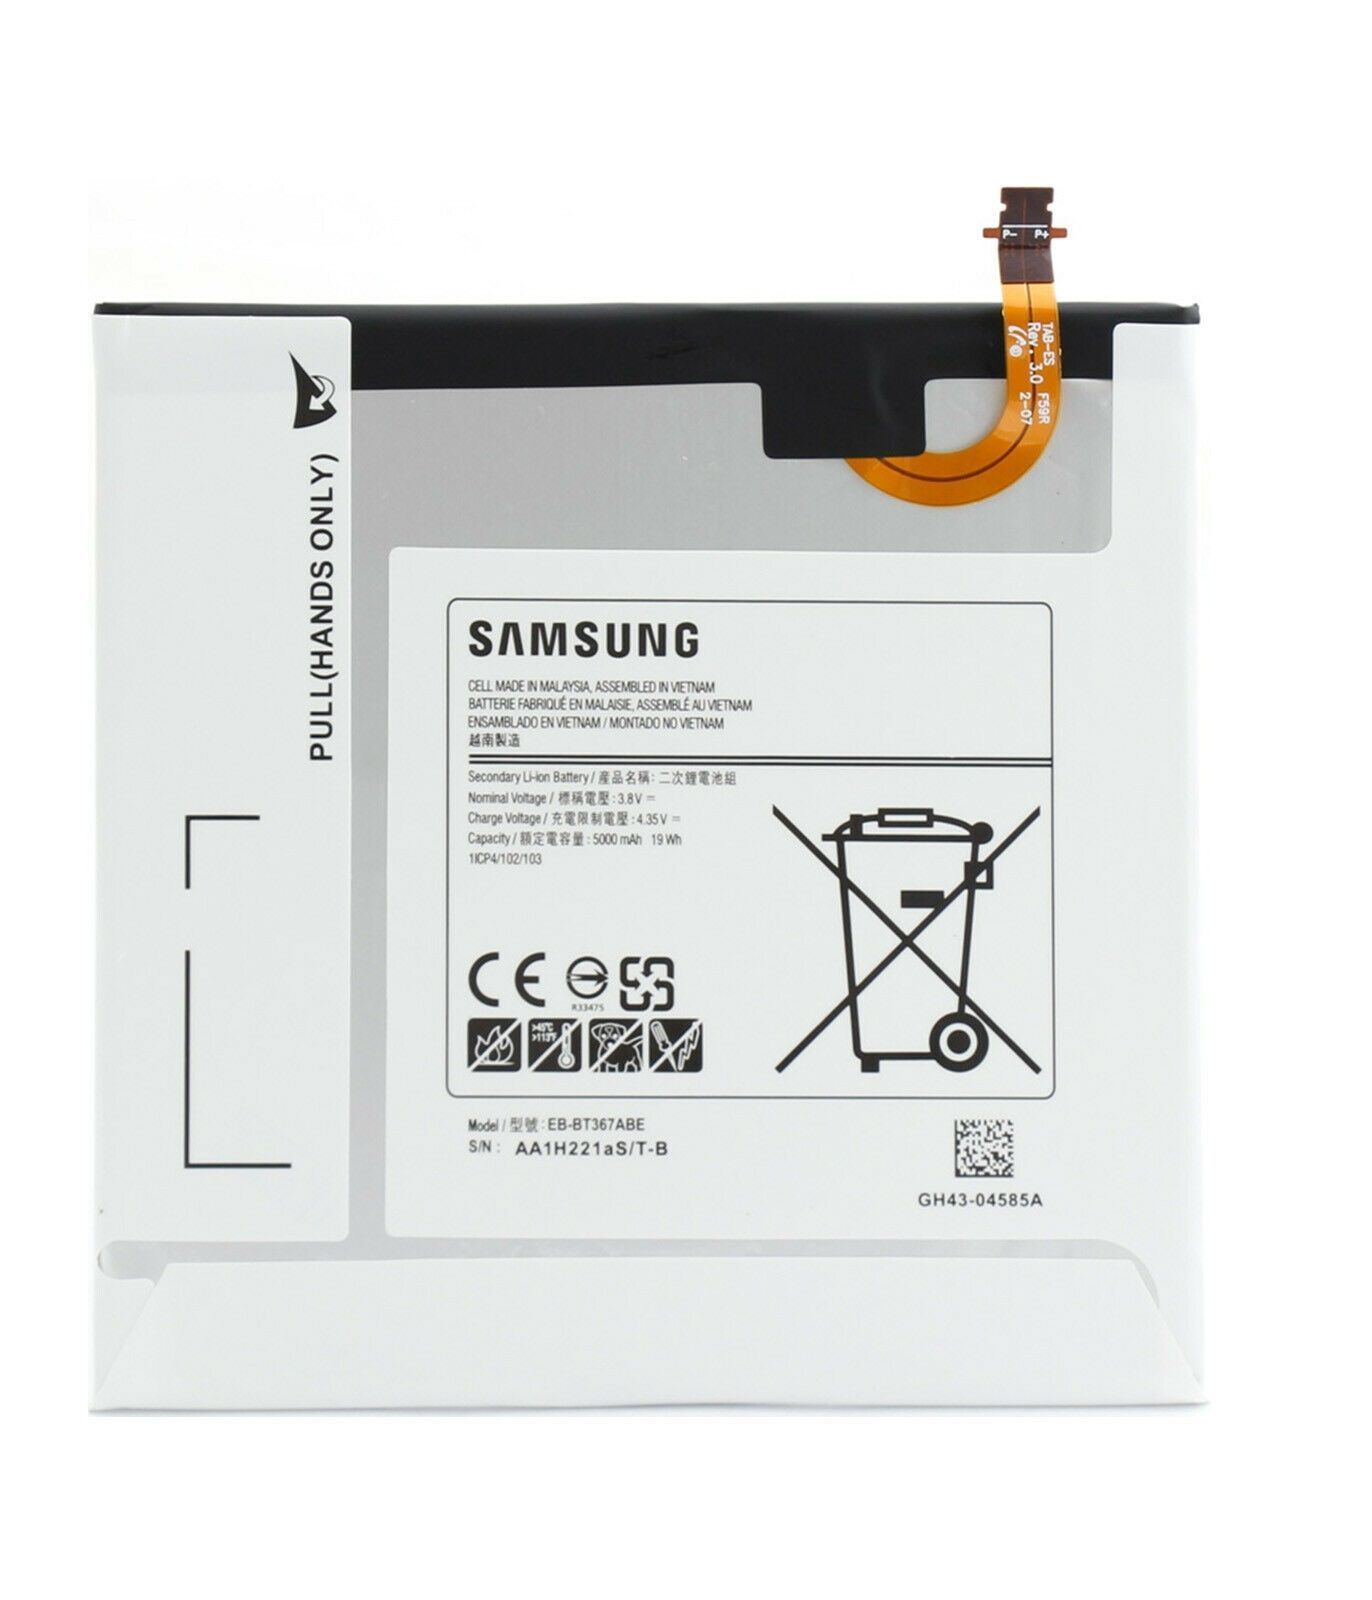 Astonishing Battery For Use With Samsung Galaxy Tab E 8 0 Evergreenethics Interior Chair Design Evergreenethicsorg